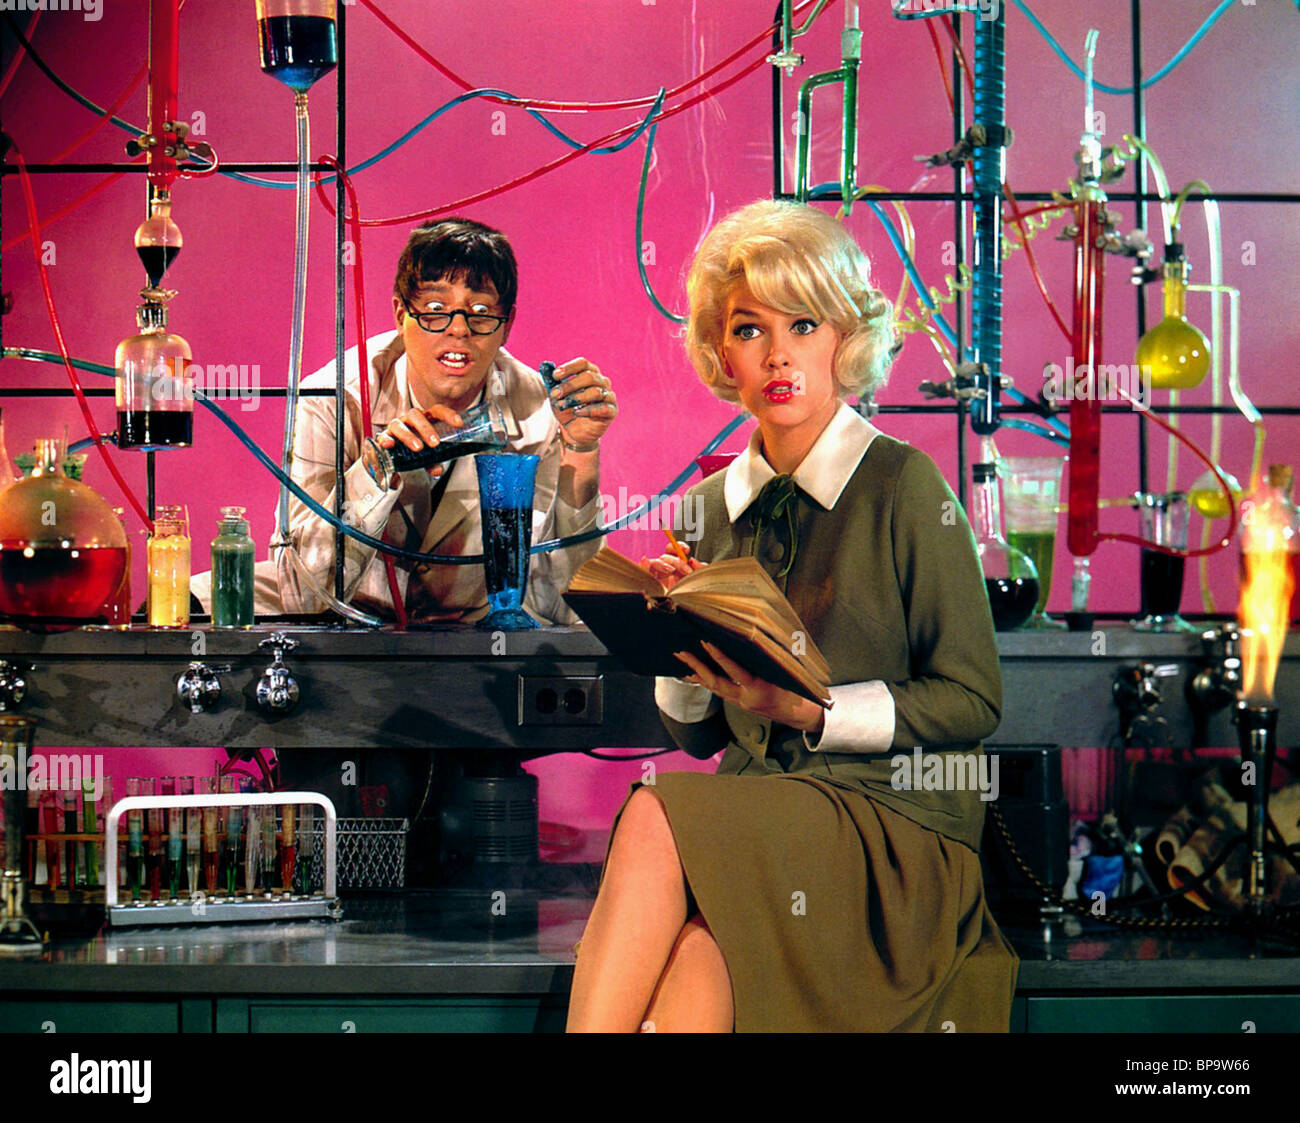 "1963 JERRY LEWIS /& STELLA STEVENS /""THE NUTTY PROFESSOR/""  PHOTO"